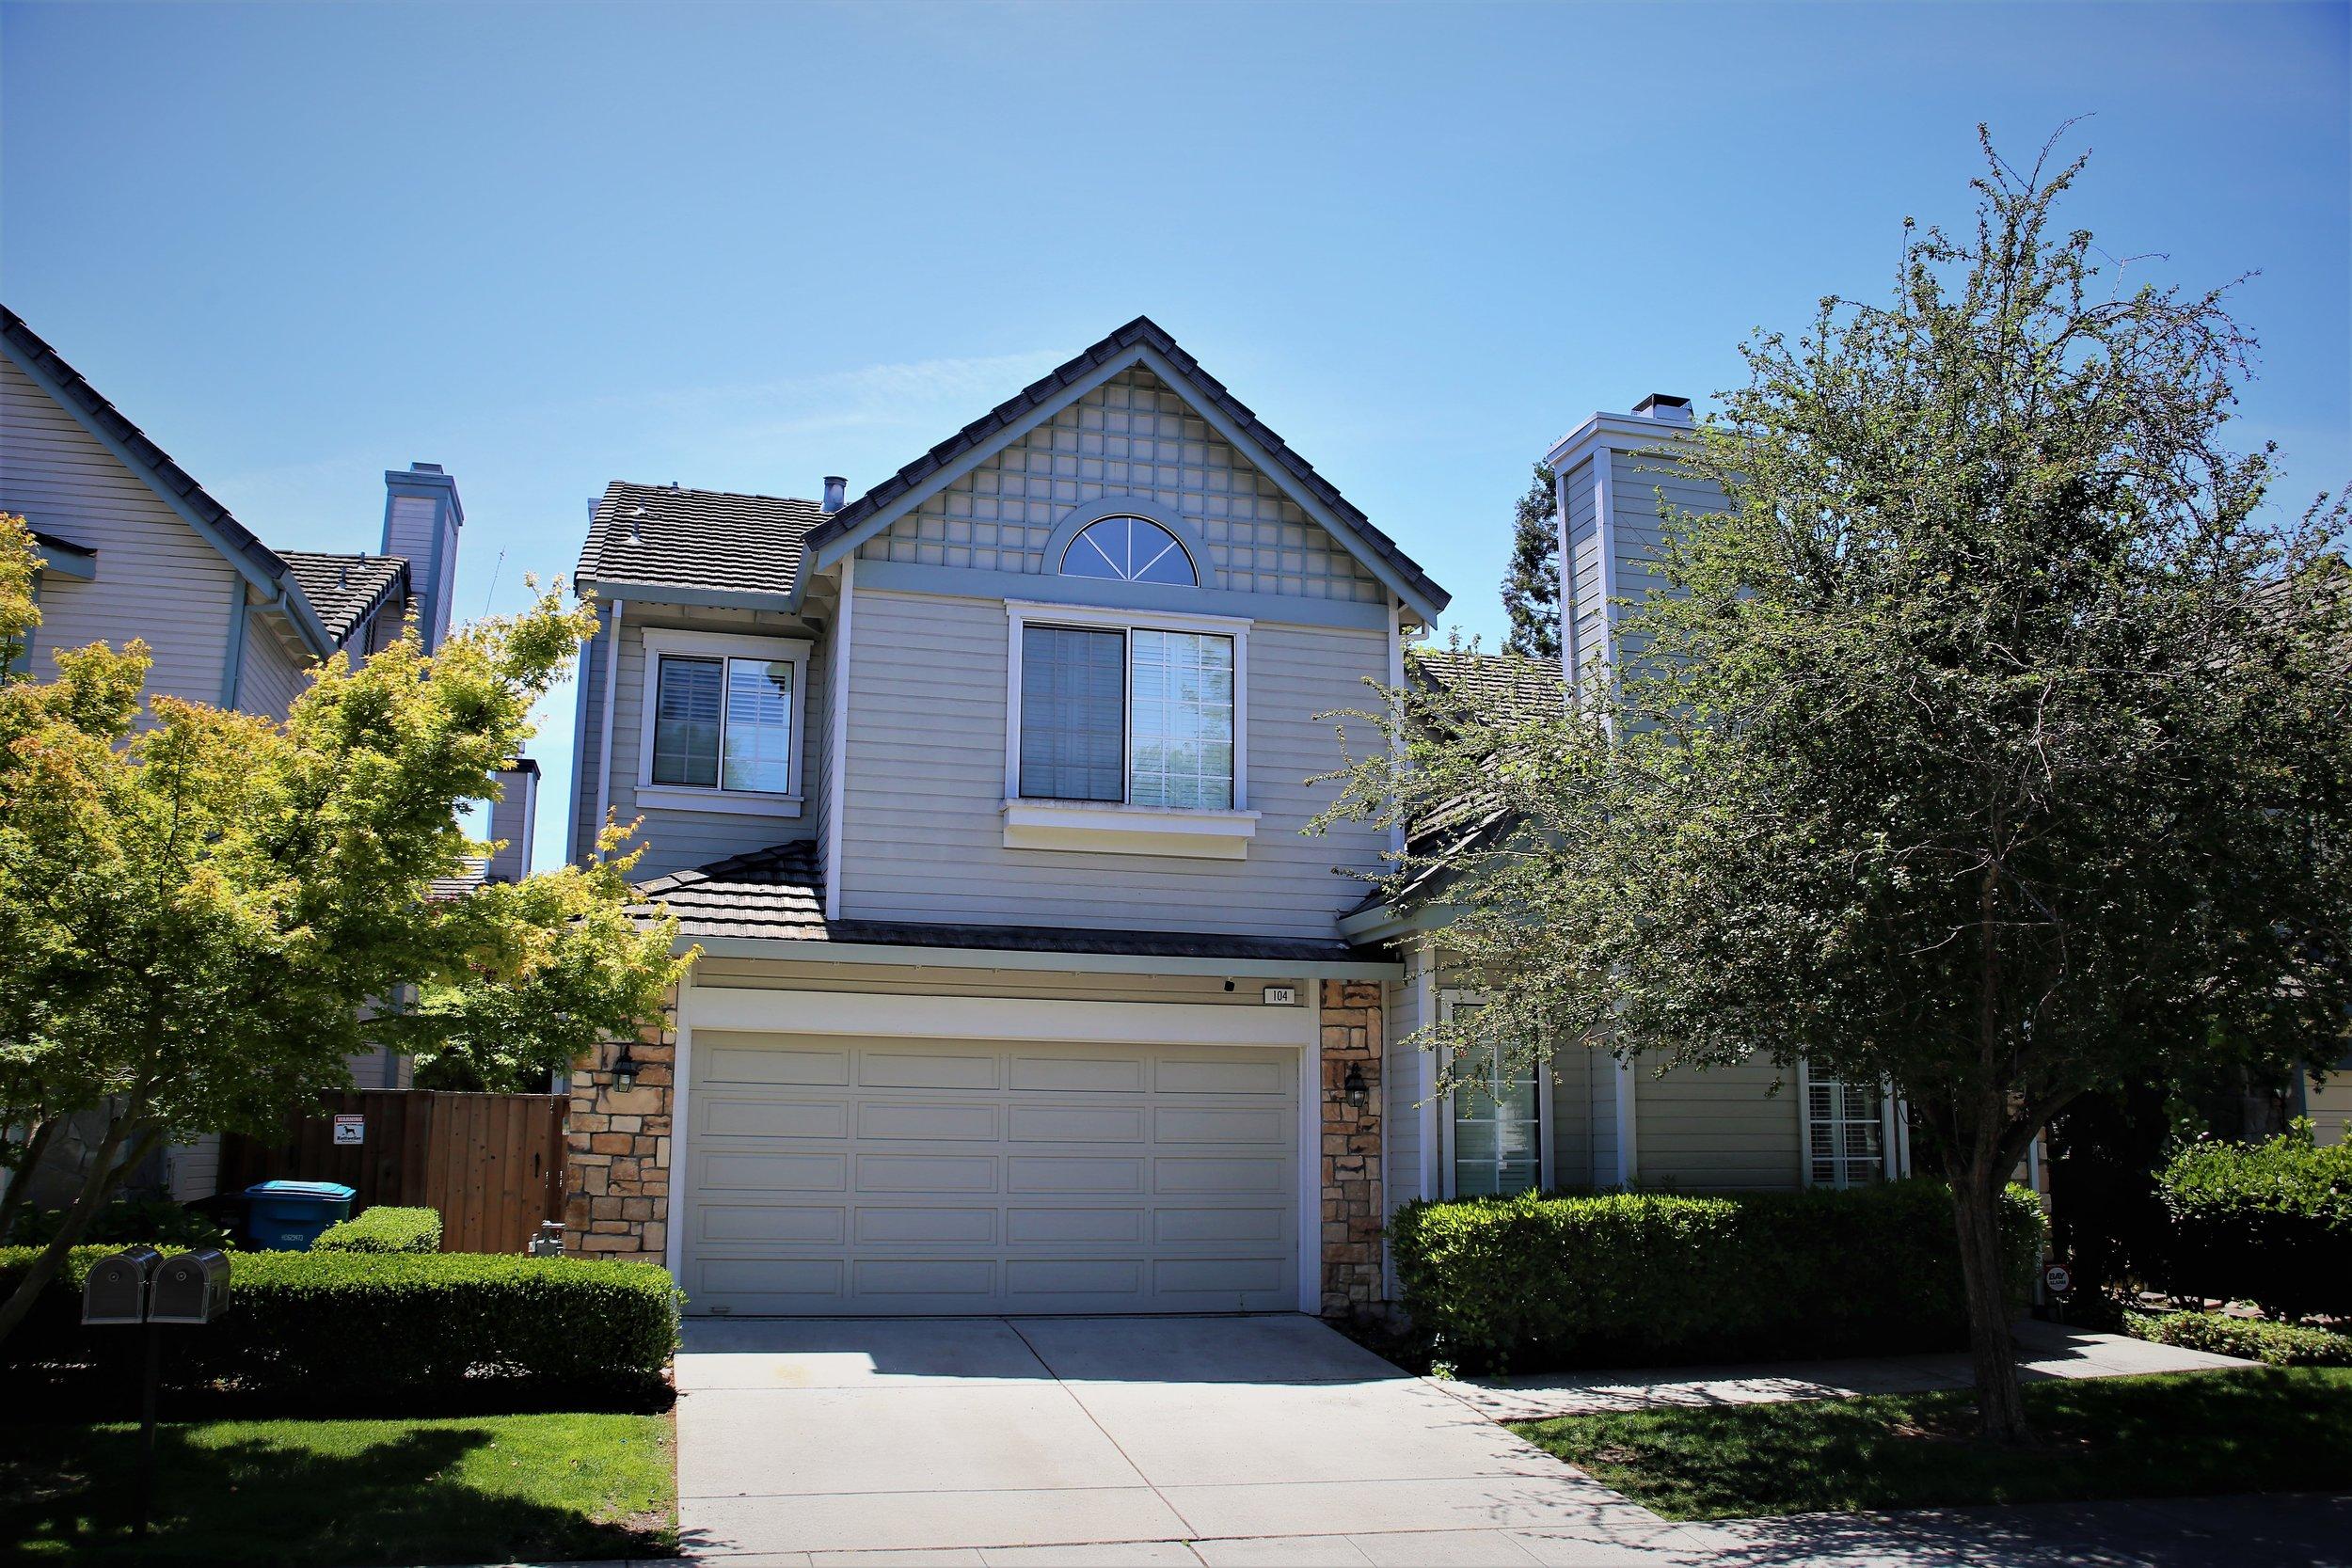 $2,185,000 | 104 Horgan Ave., Redwood City